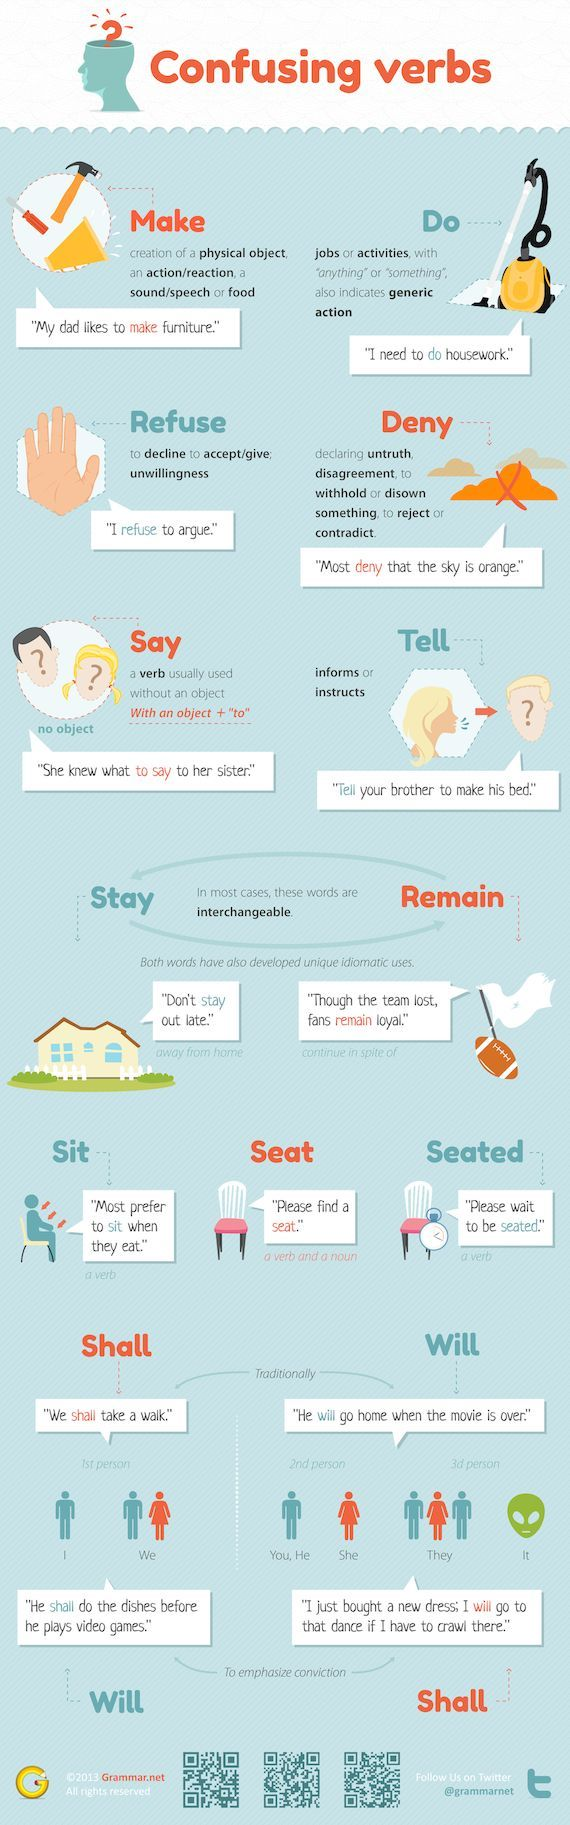 Confusing verbs infographic #bilingualism #grammar